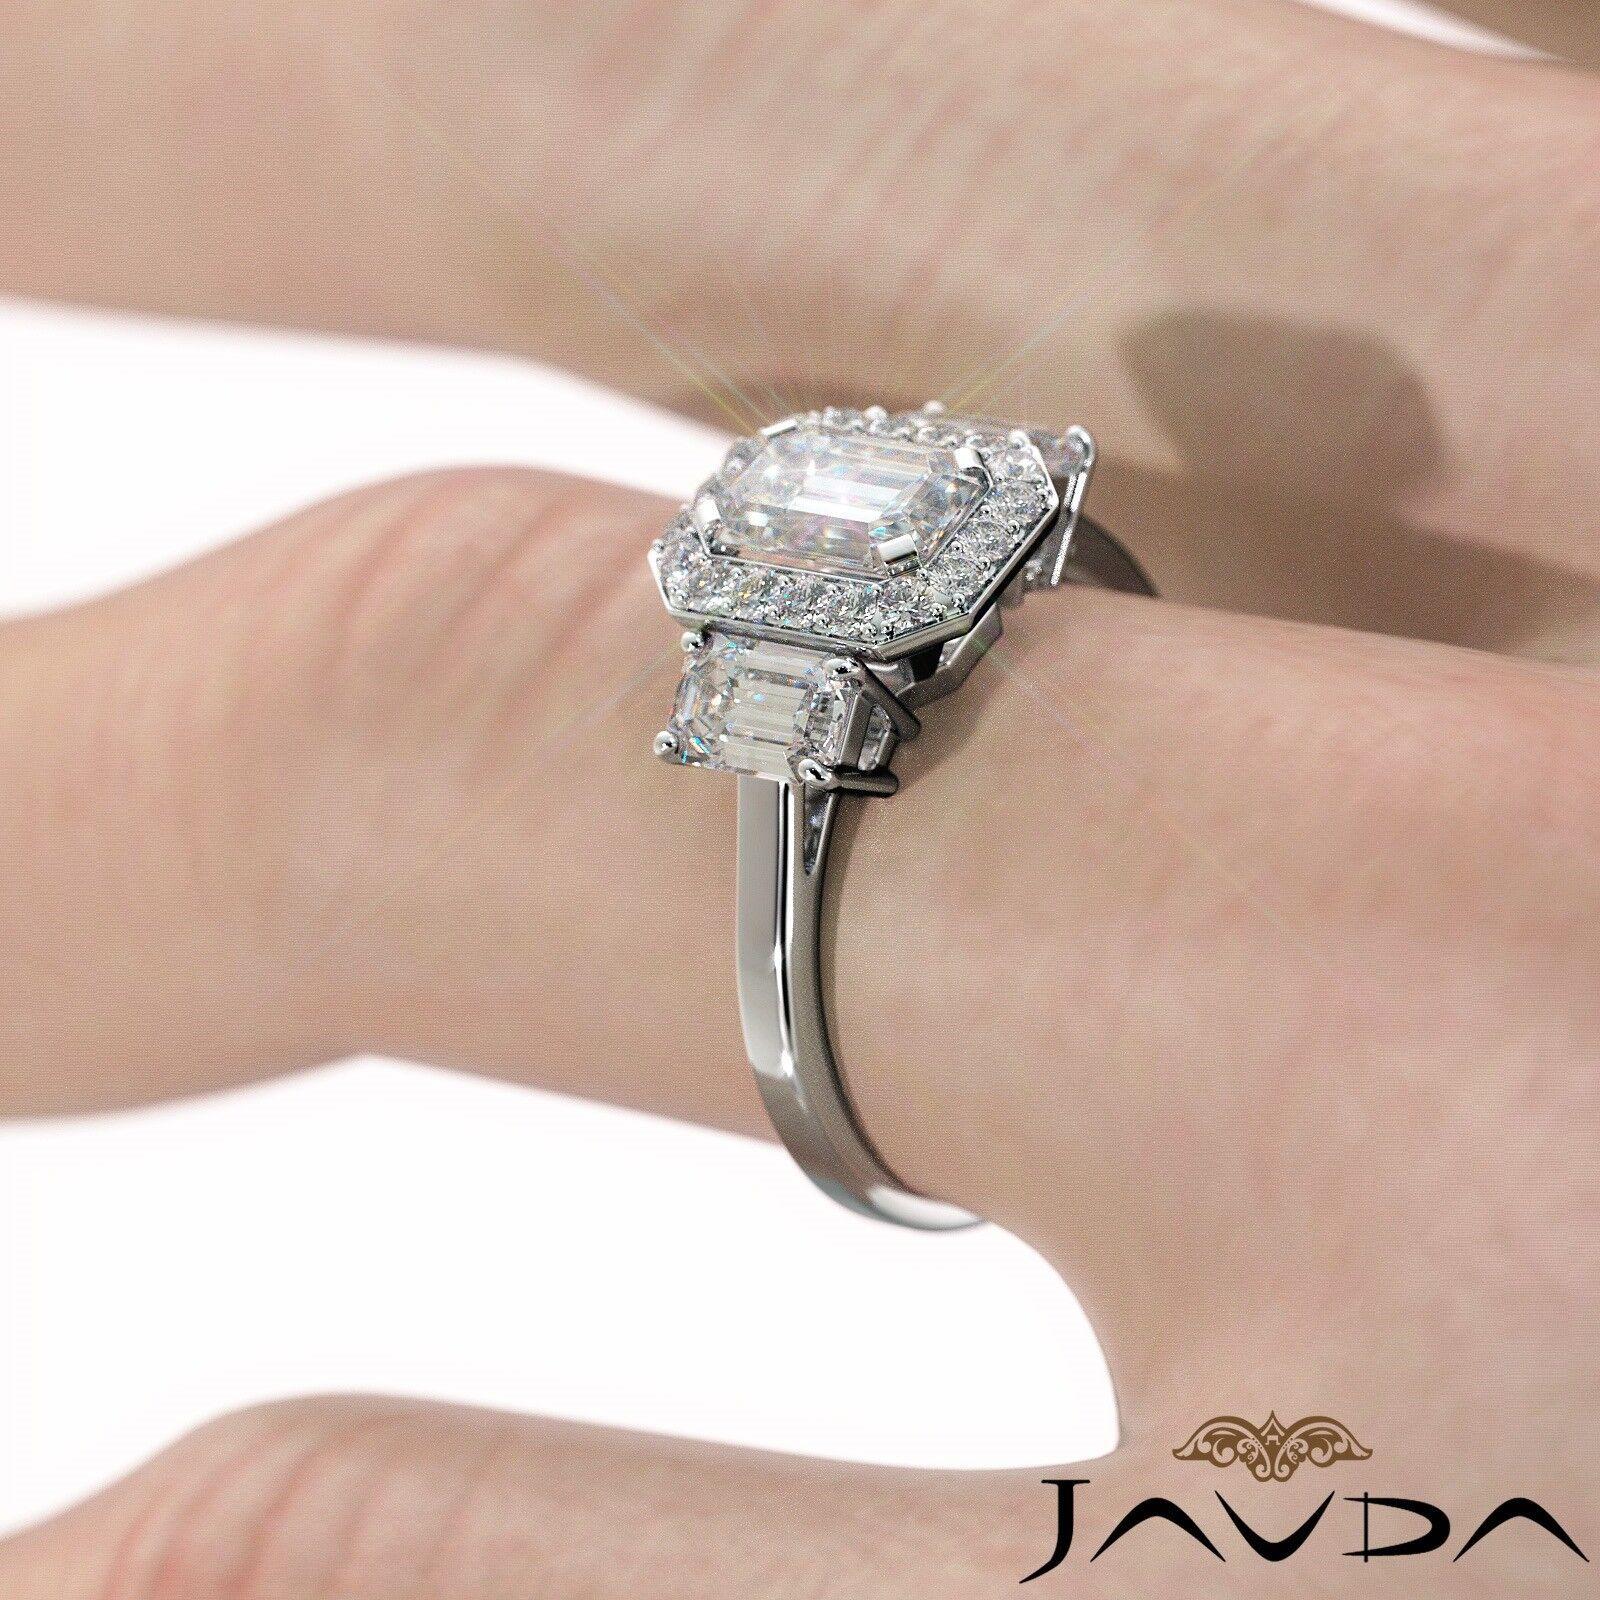 1.55ctw 3 Stone Halo Pave Emerald Diamond Engagement Ring GIA F-SI2 White Gold 6